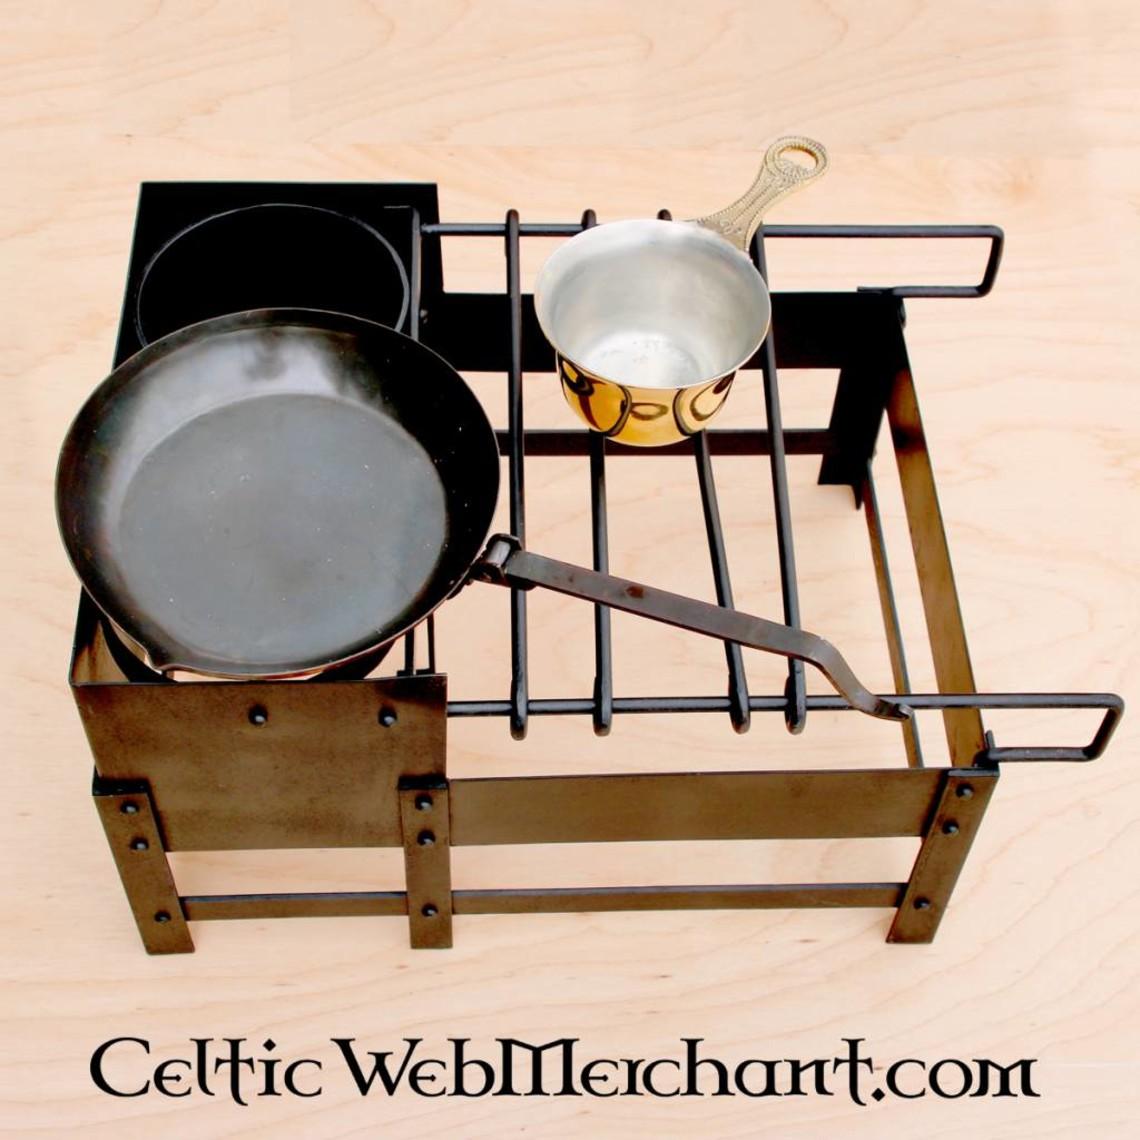 Deepeeka Roman cooking rack